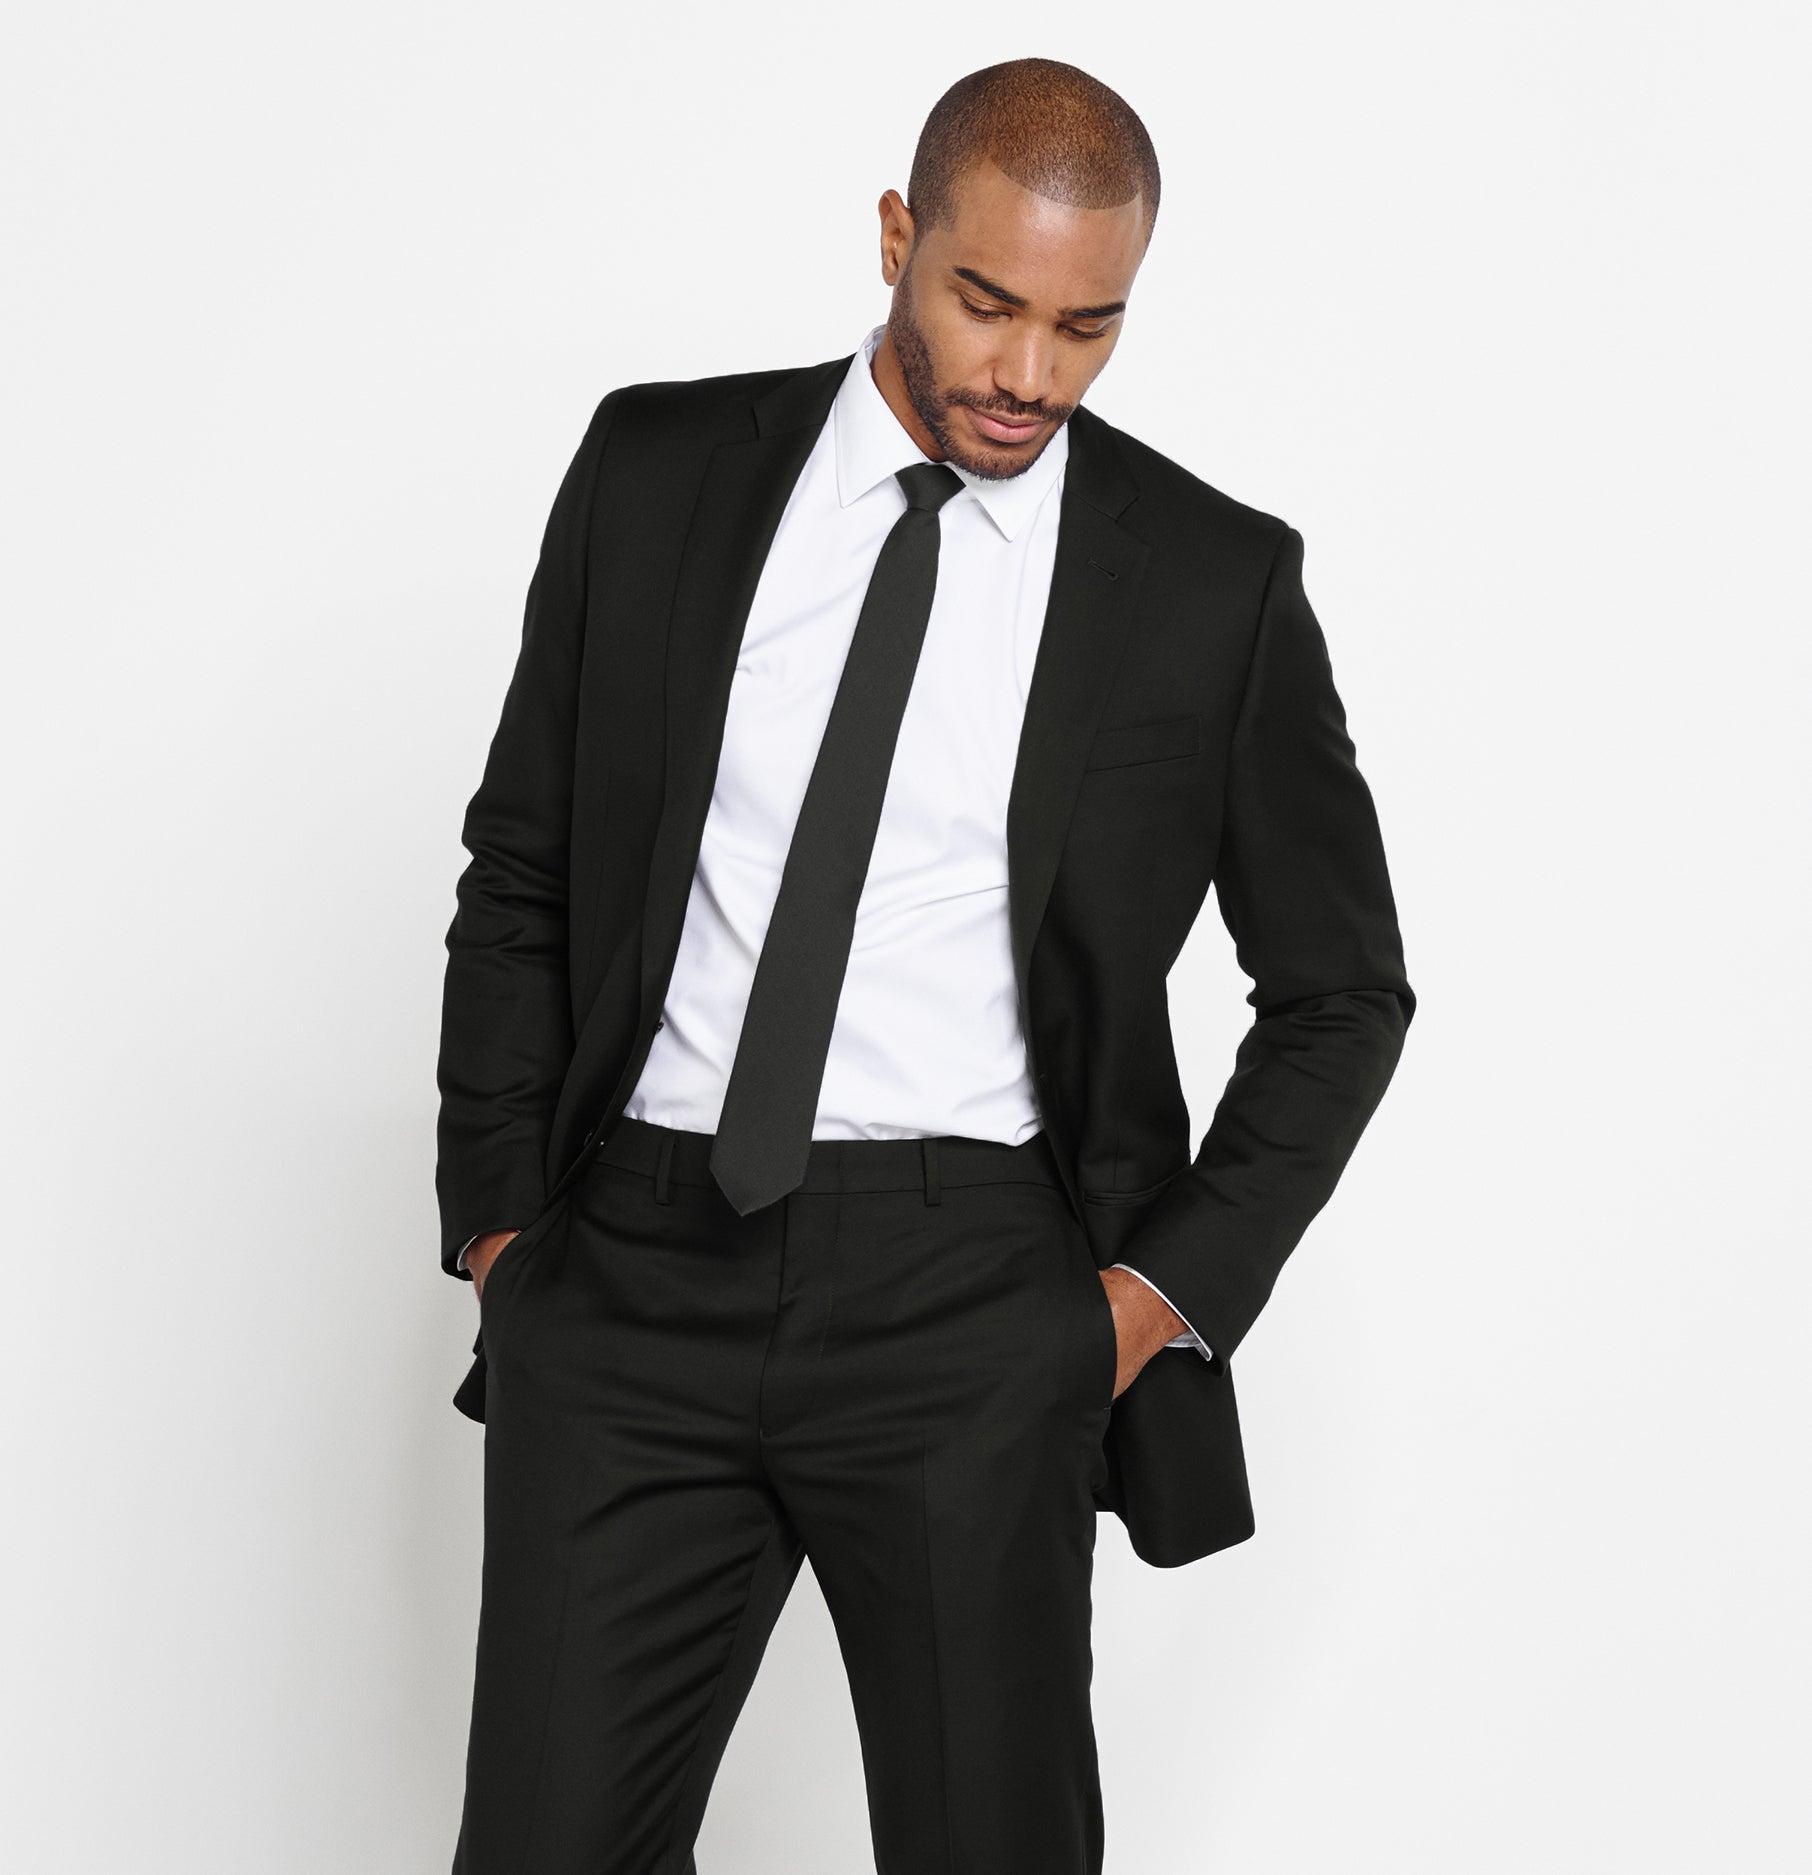 Black Complete Tuxedo Suit